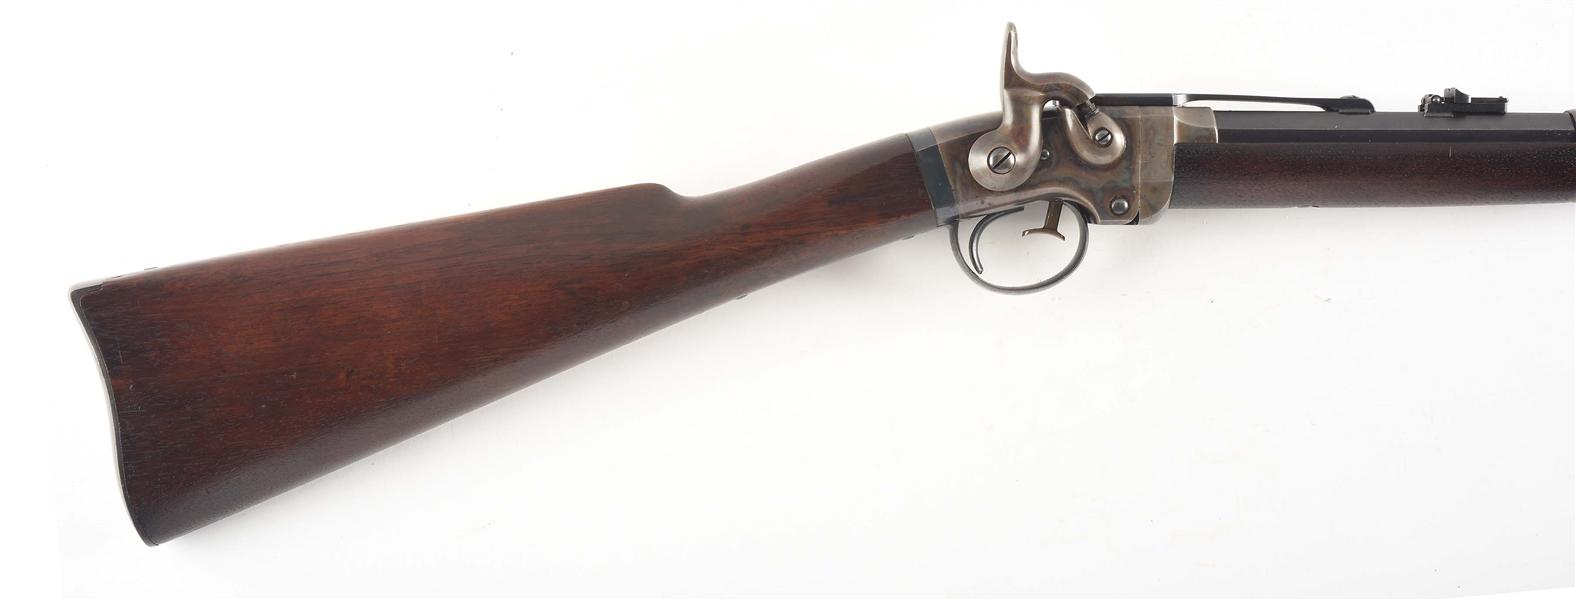 Lot Detail - (A) HIGH CONDITION SMITH CIVIL WAR ERA CARBINE